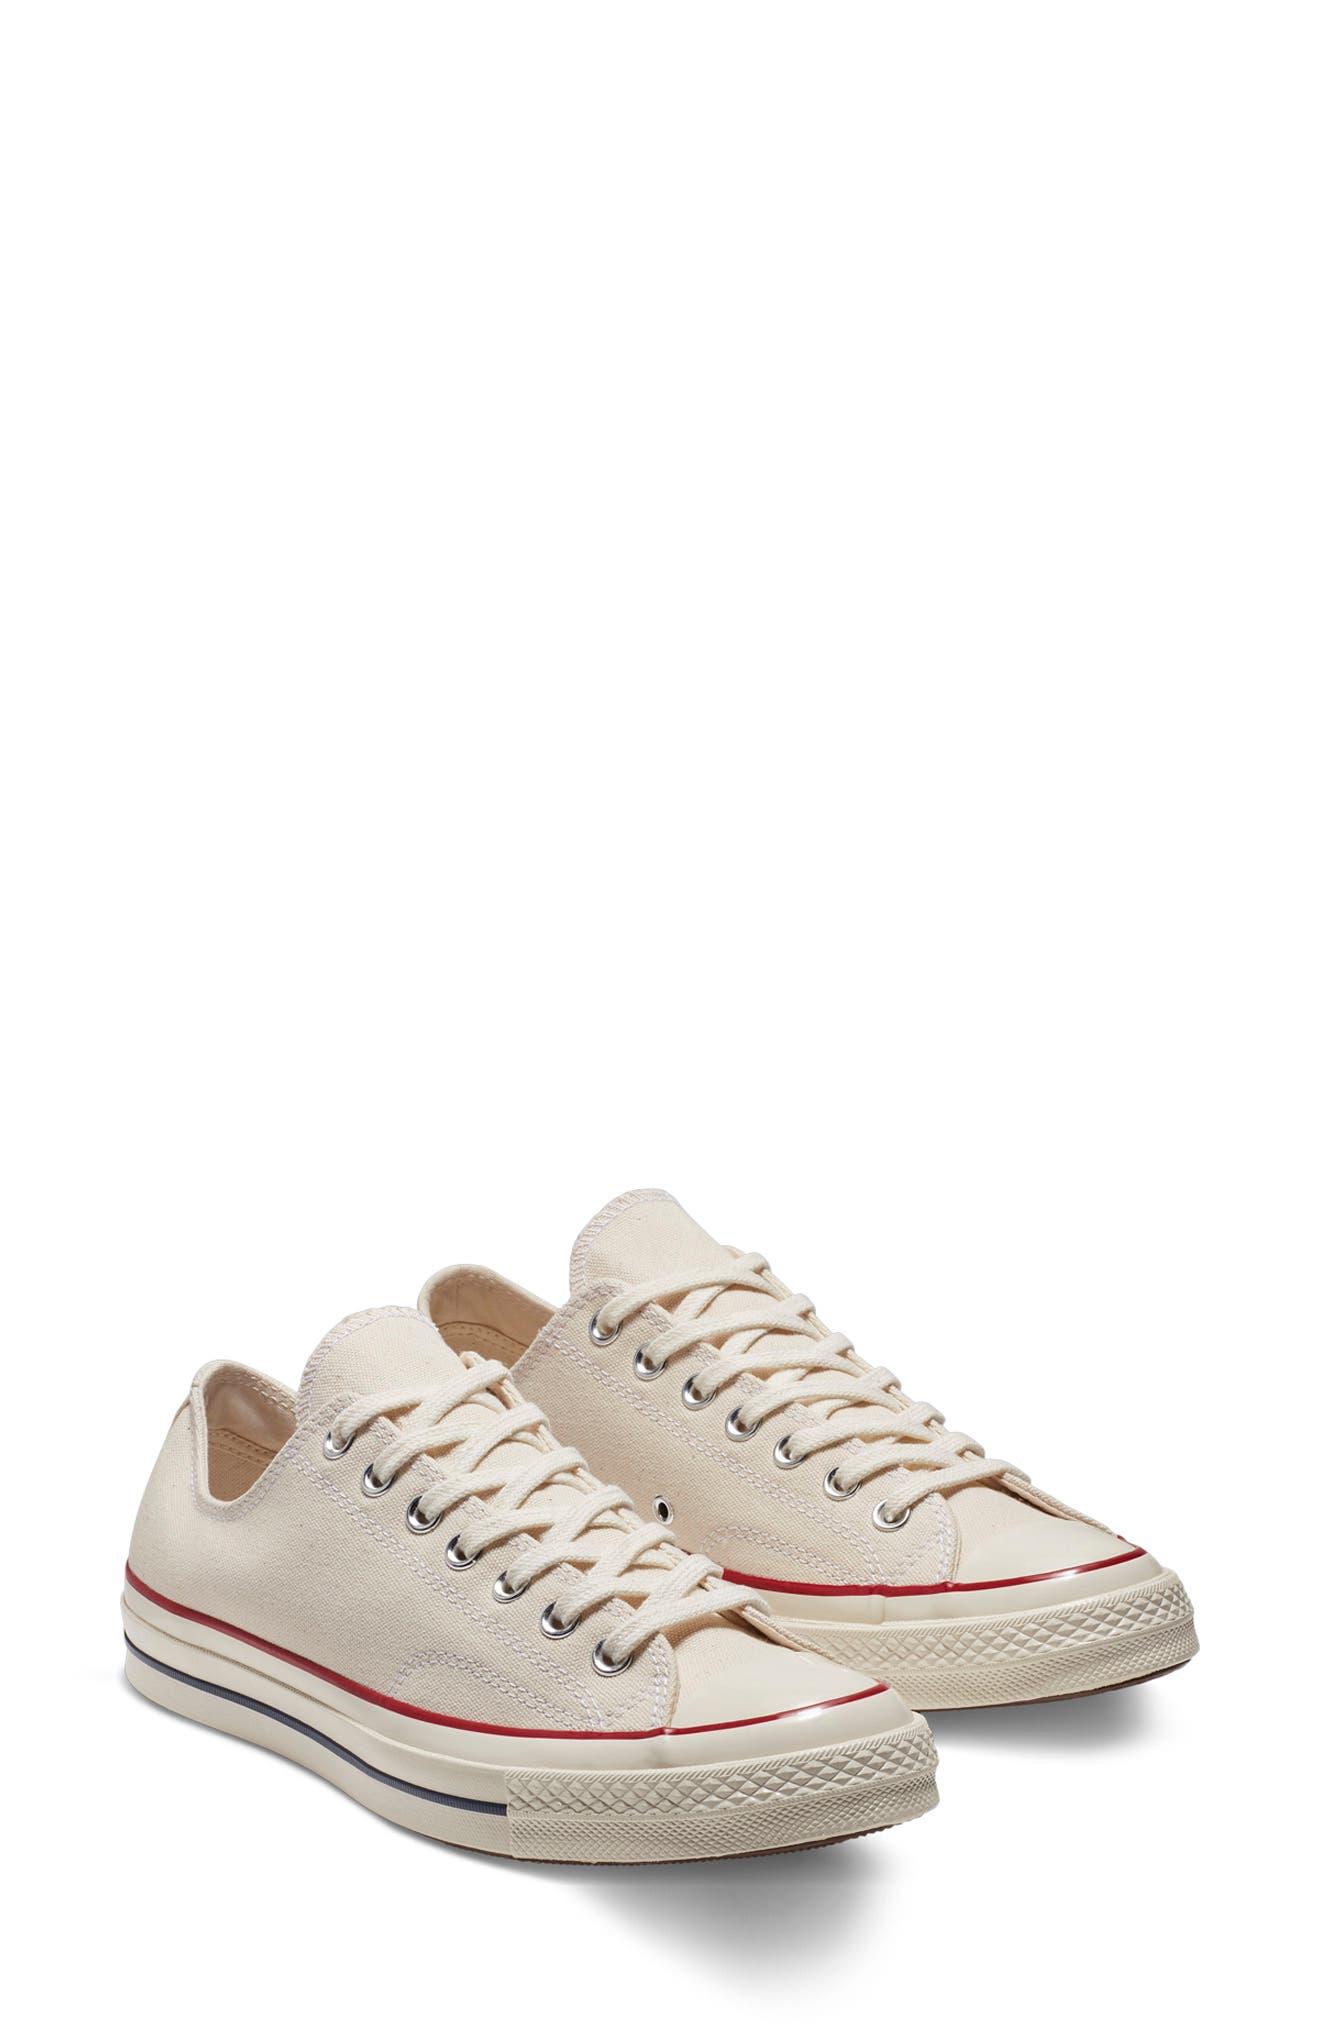 Men's Converse Chuck Taylor All Star 70 Low Top Sneaker